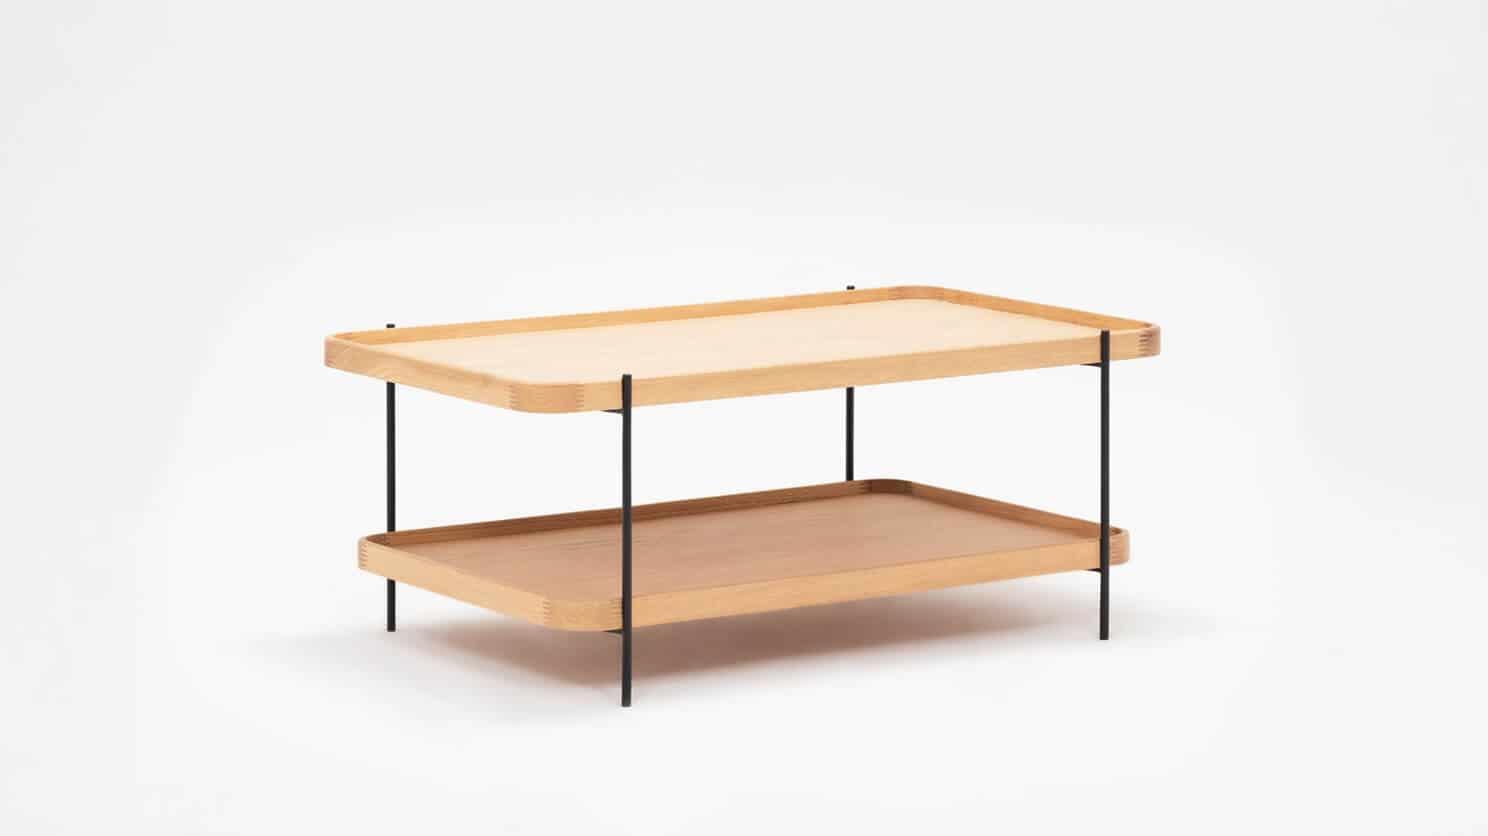 3020 419 16 1 coffee tables sage rectangular coffee table oak corner 01 1